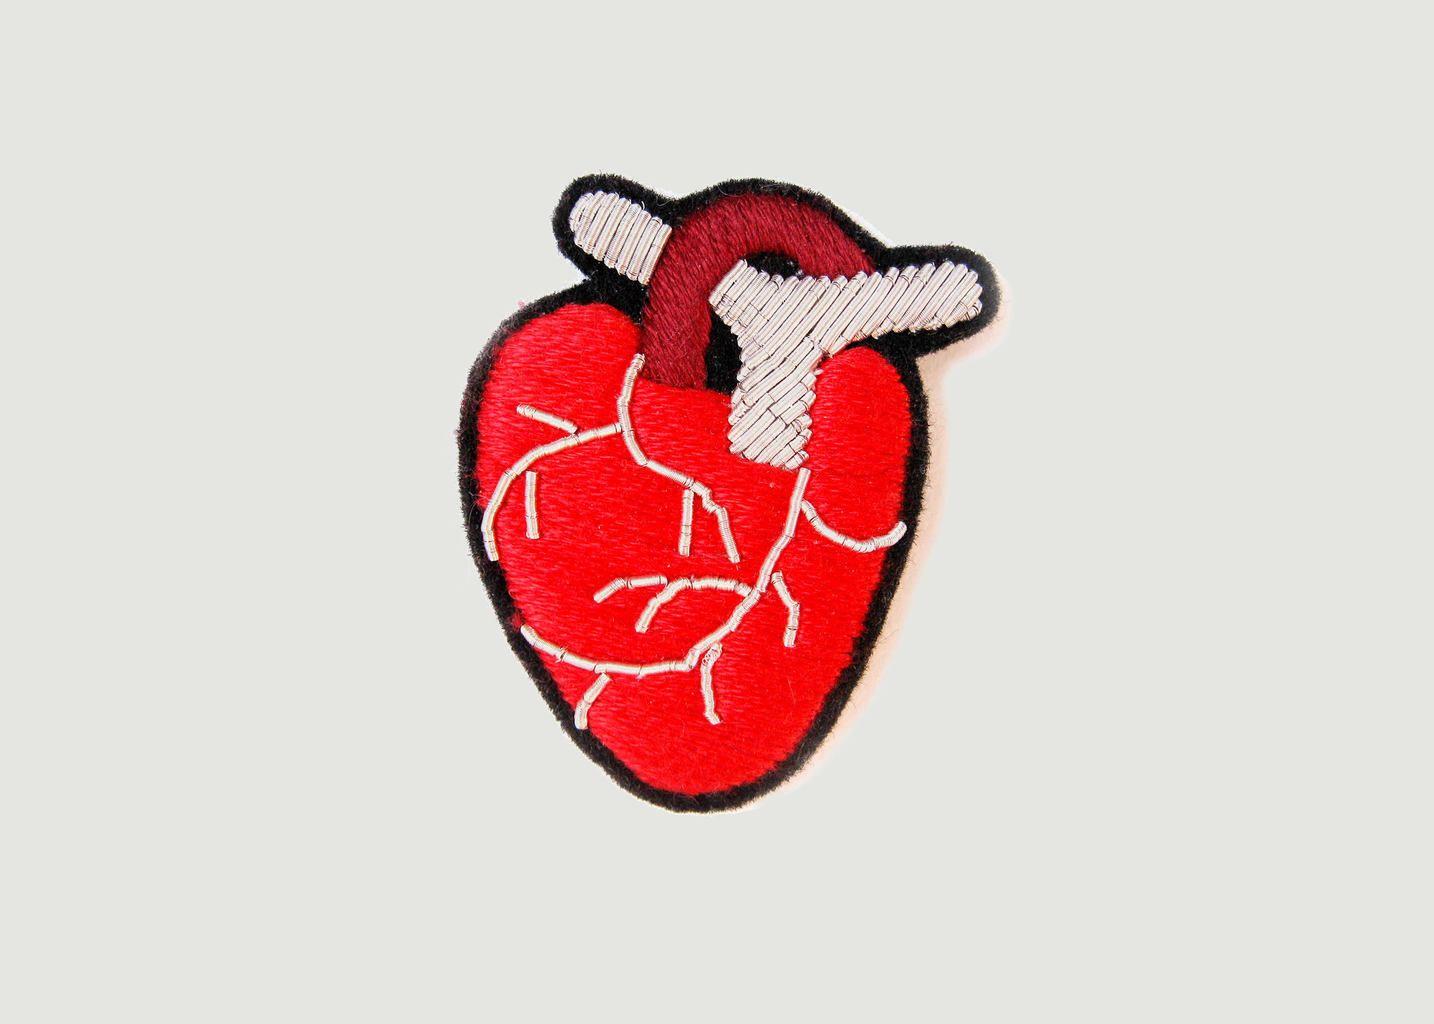 Broche Coeur Anatomique - Macon & Lesquoy